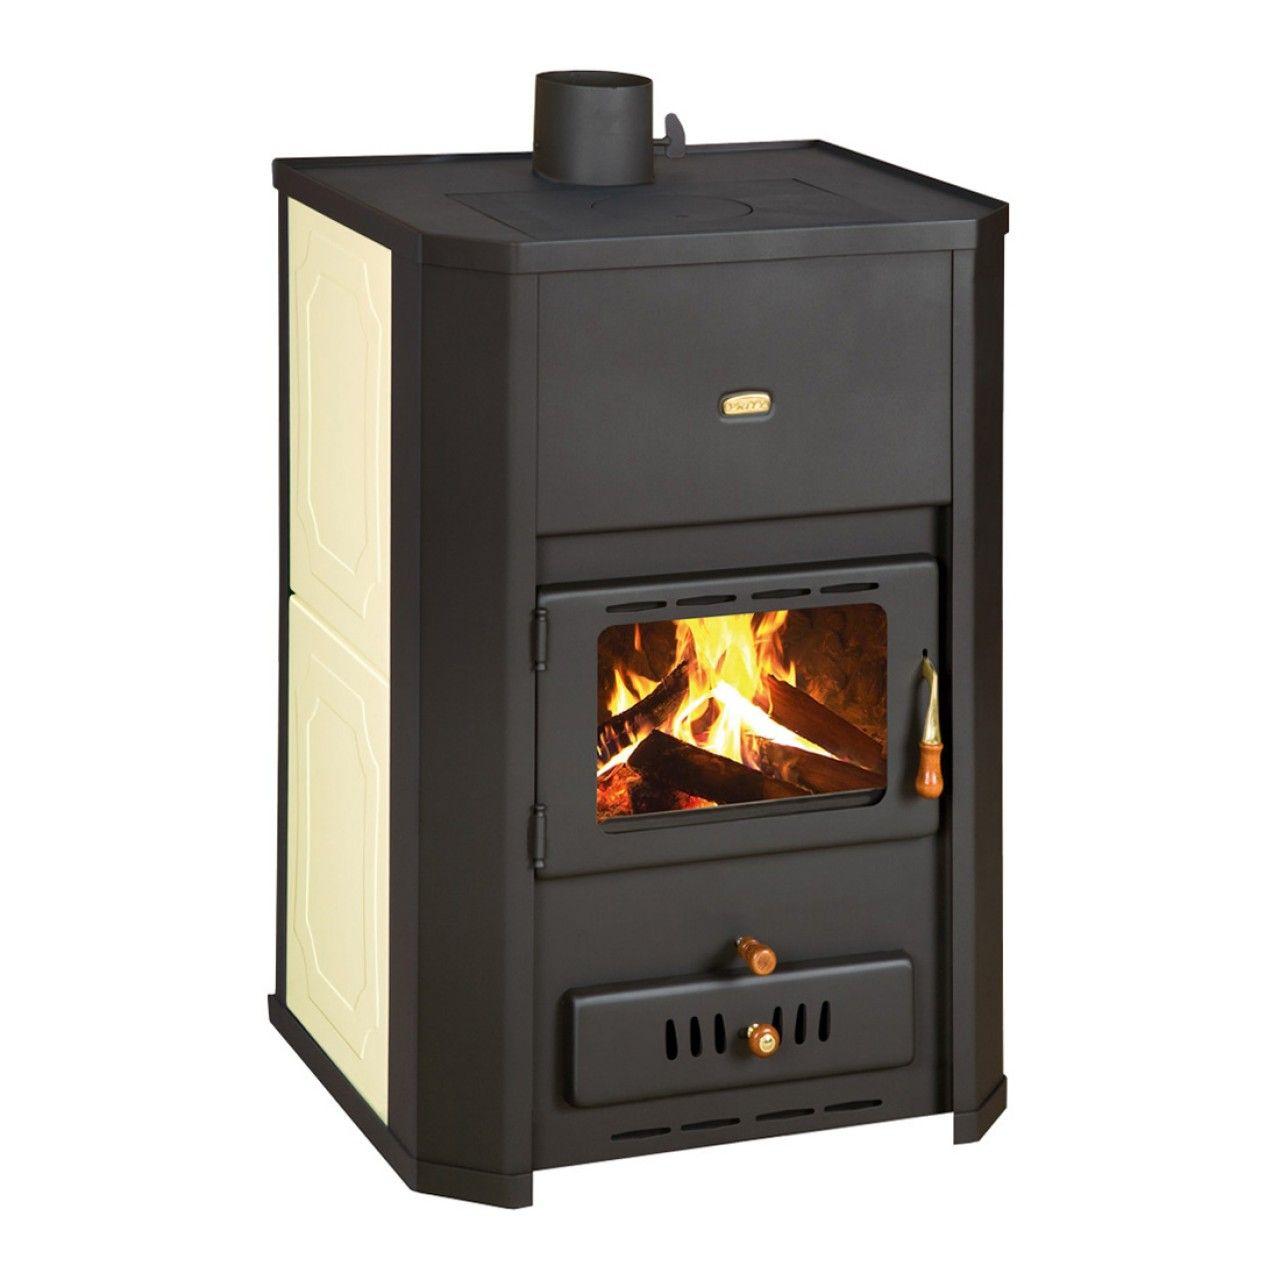 Semineu Pe Lemne Brichete Carbune Prity Wd W24 24 Kw Boiler Incorporat Boiler Wood Home Appliances